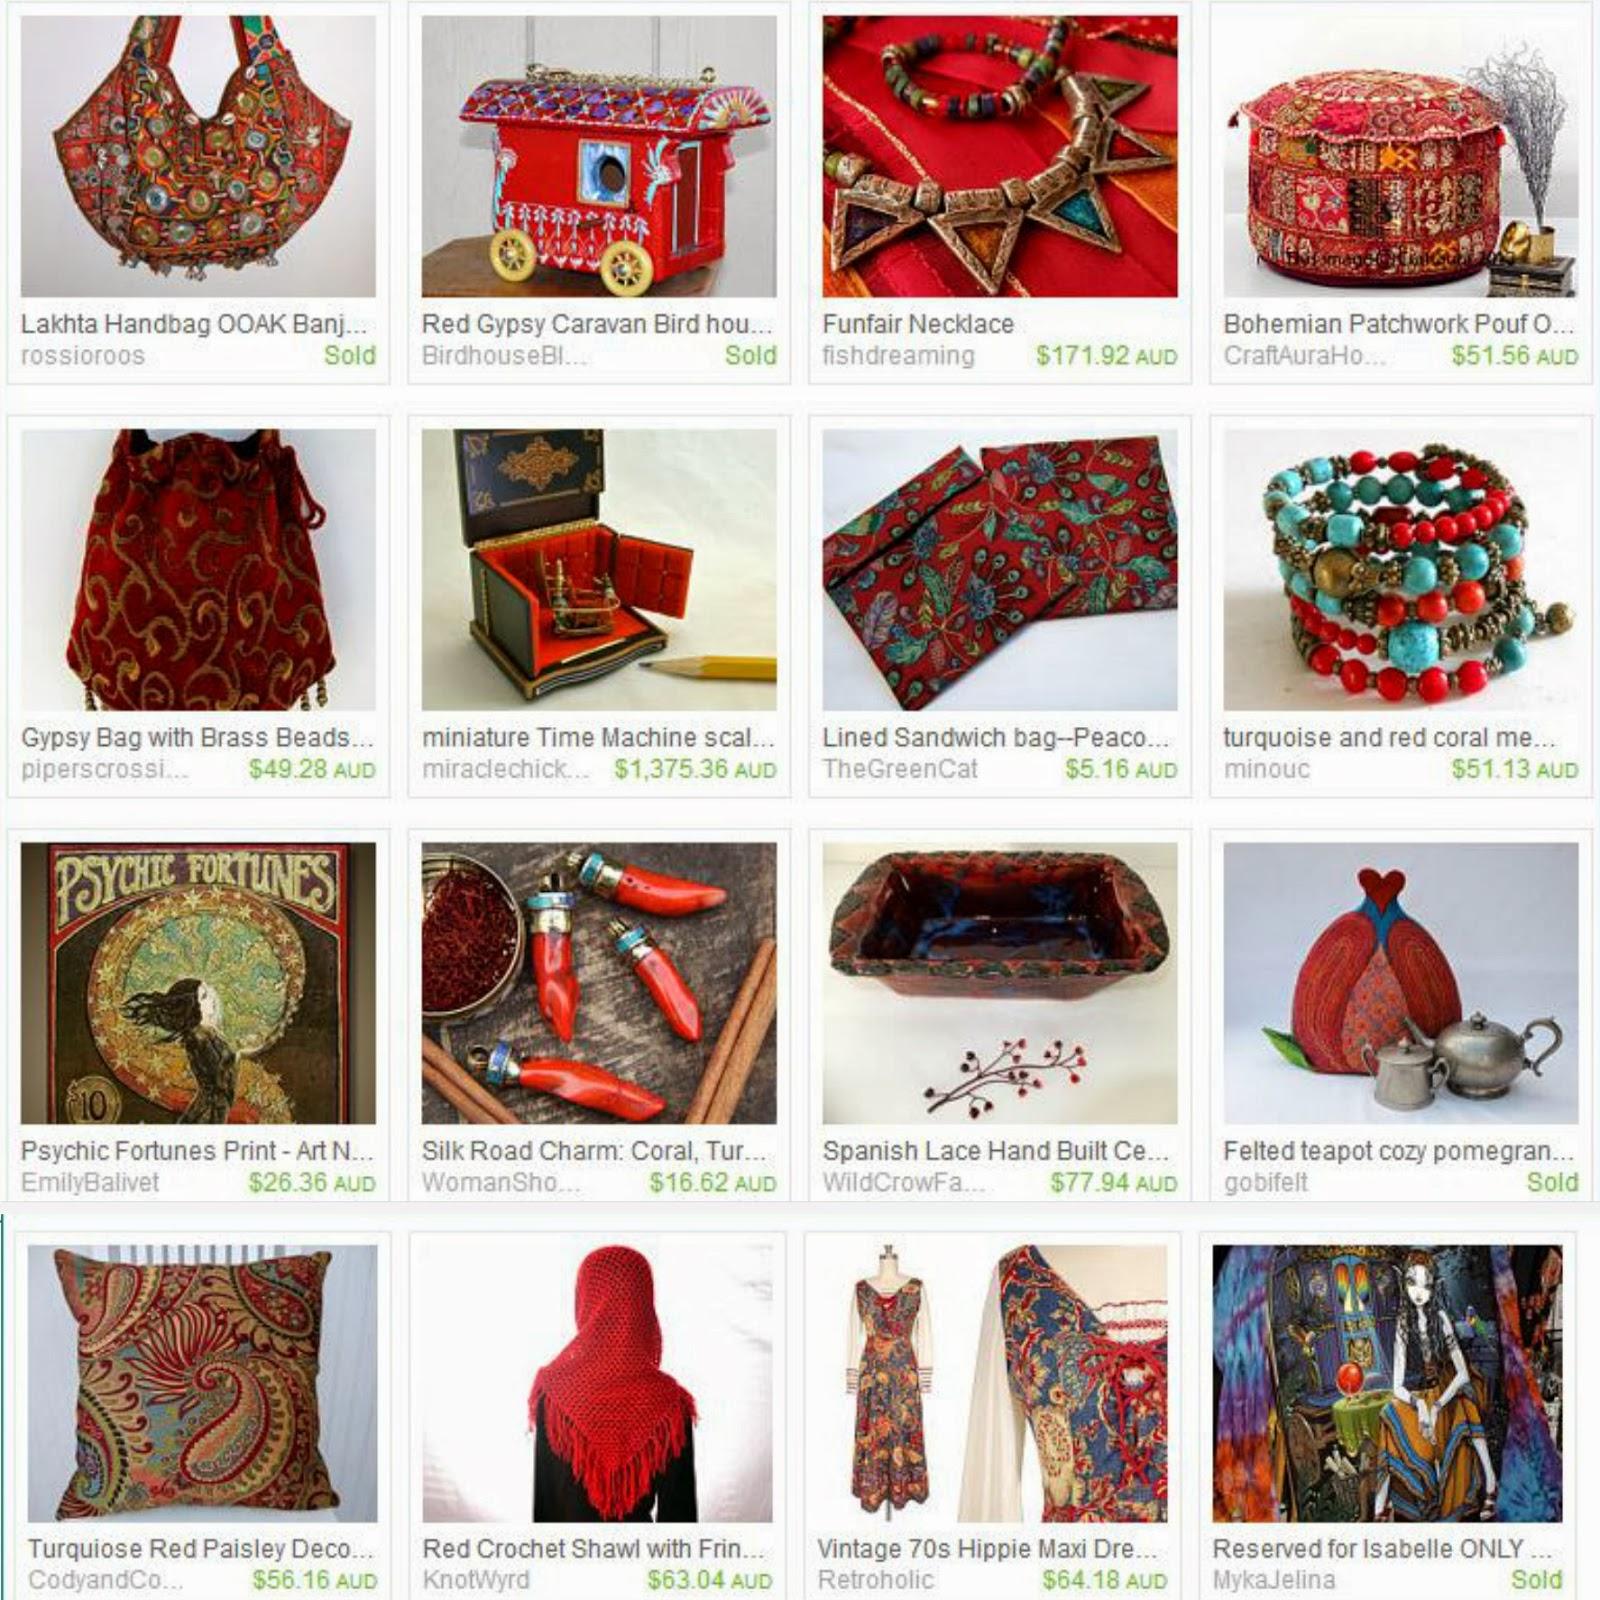 www.etsy.com/au/treasury/MTQ3MTU5NTd8MjcyMTMzMTg2Nw/bohemian-traveller